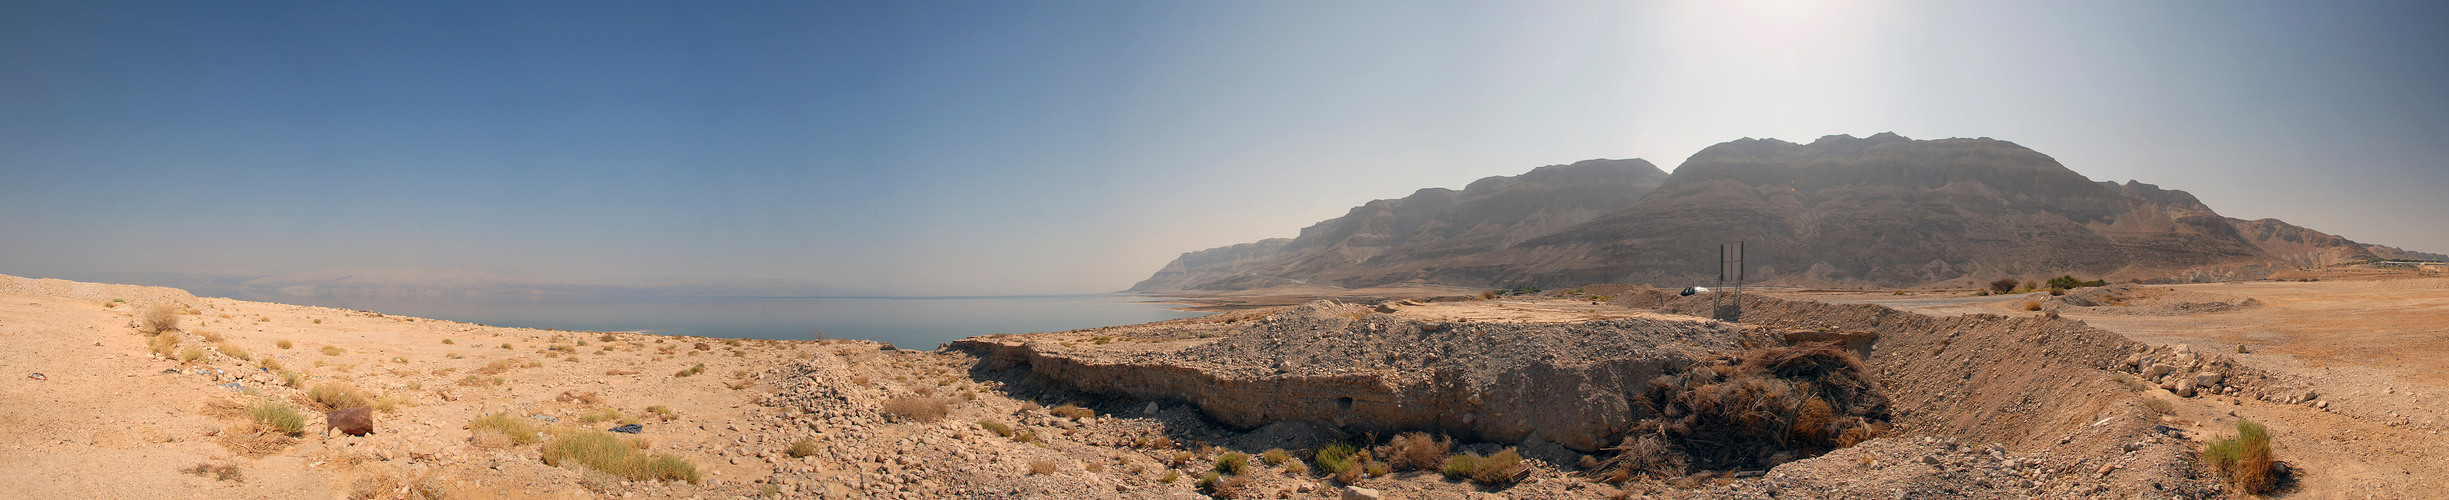 Pano Dead Sea I